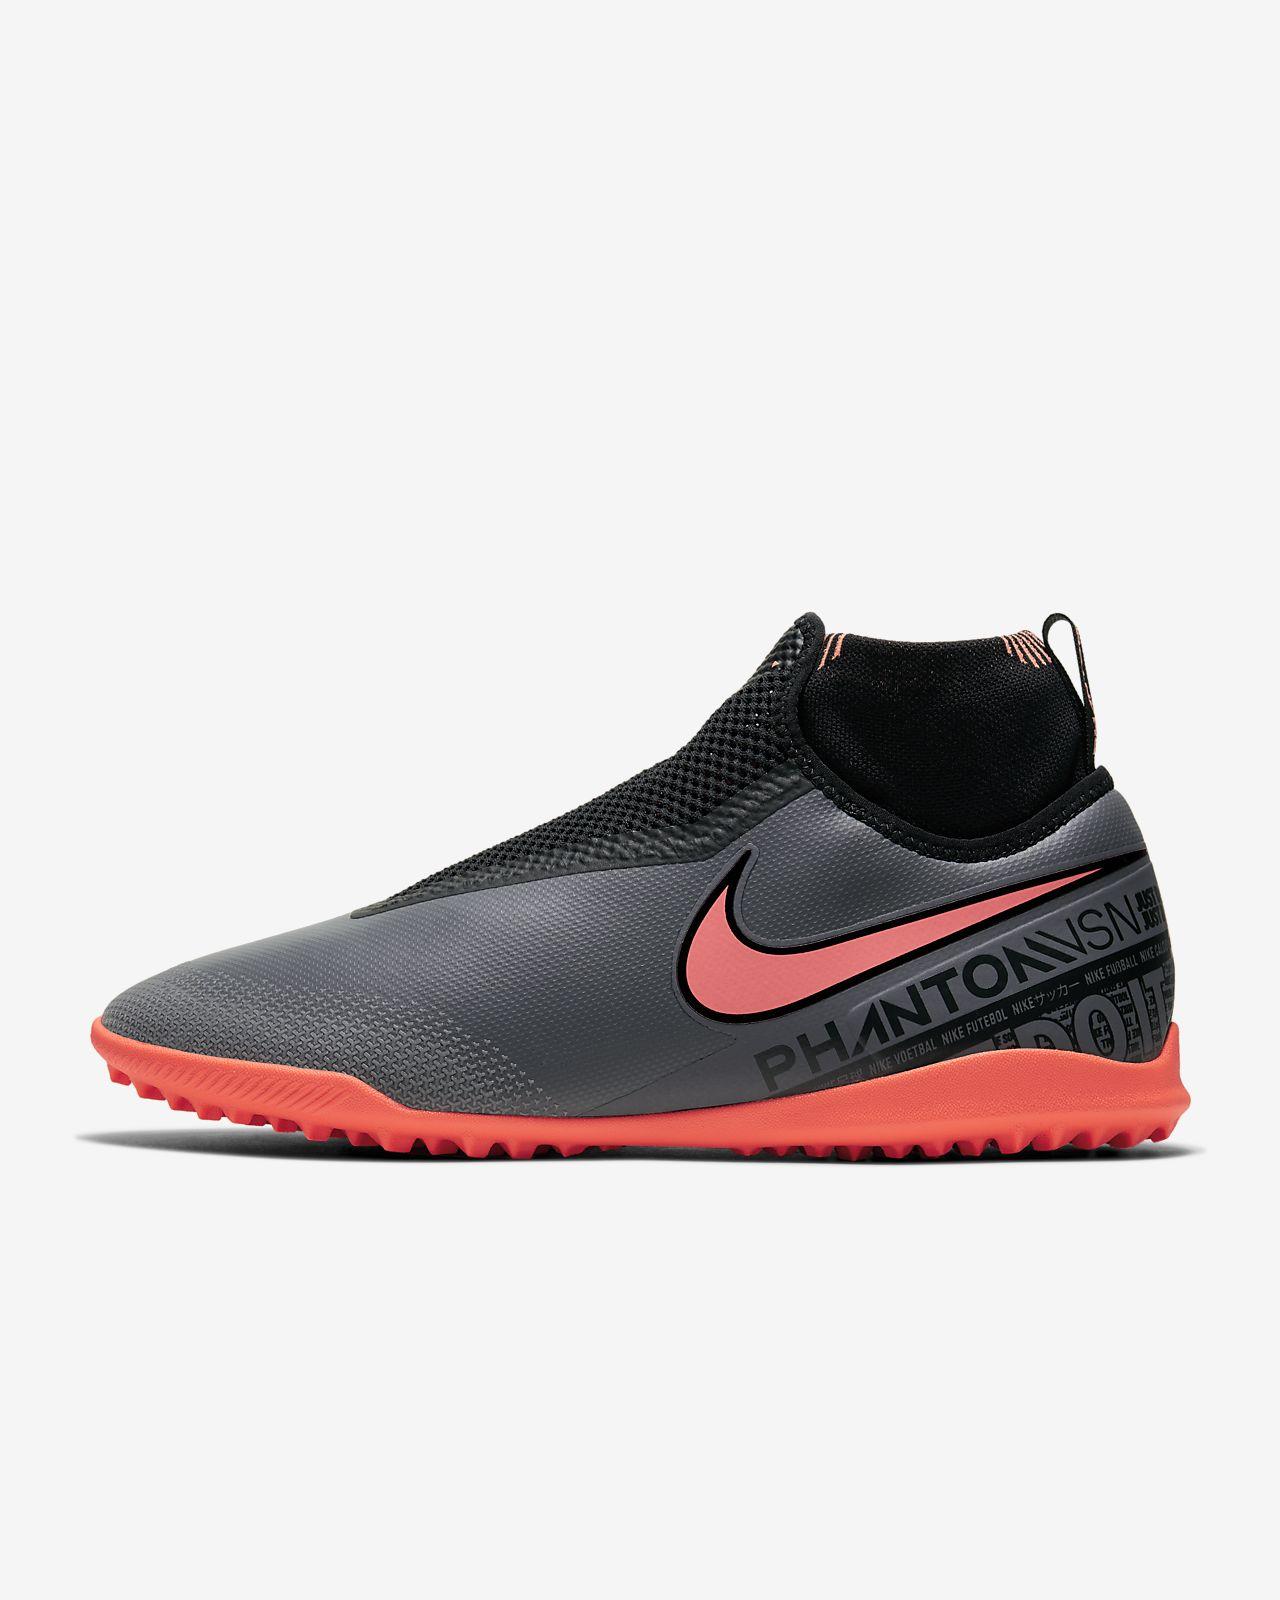 Nike React Phantom VSN Pro DF TF暗煞系列男/女人造场地足球鞋